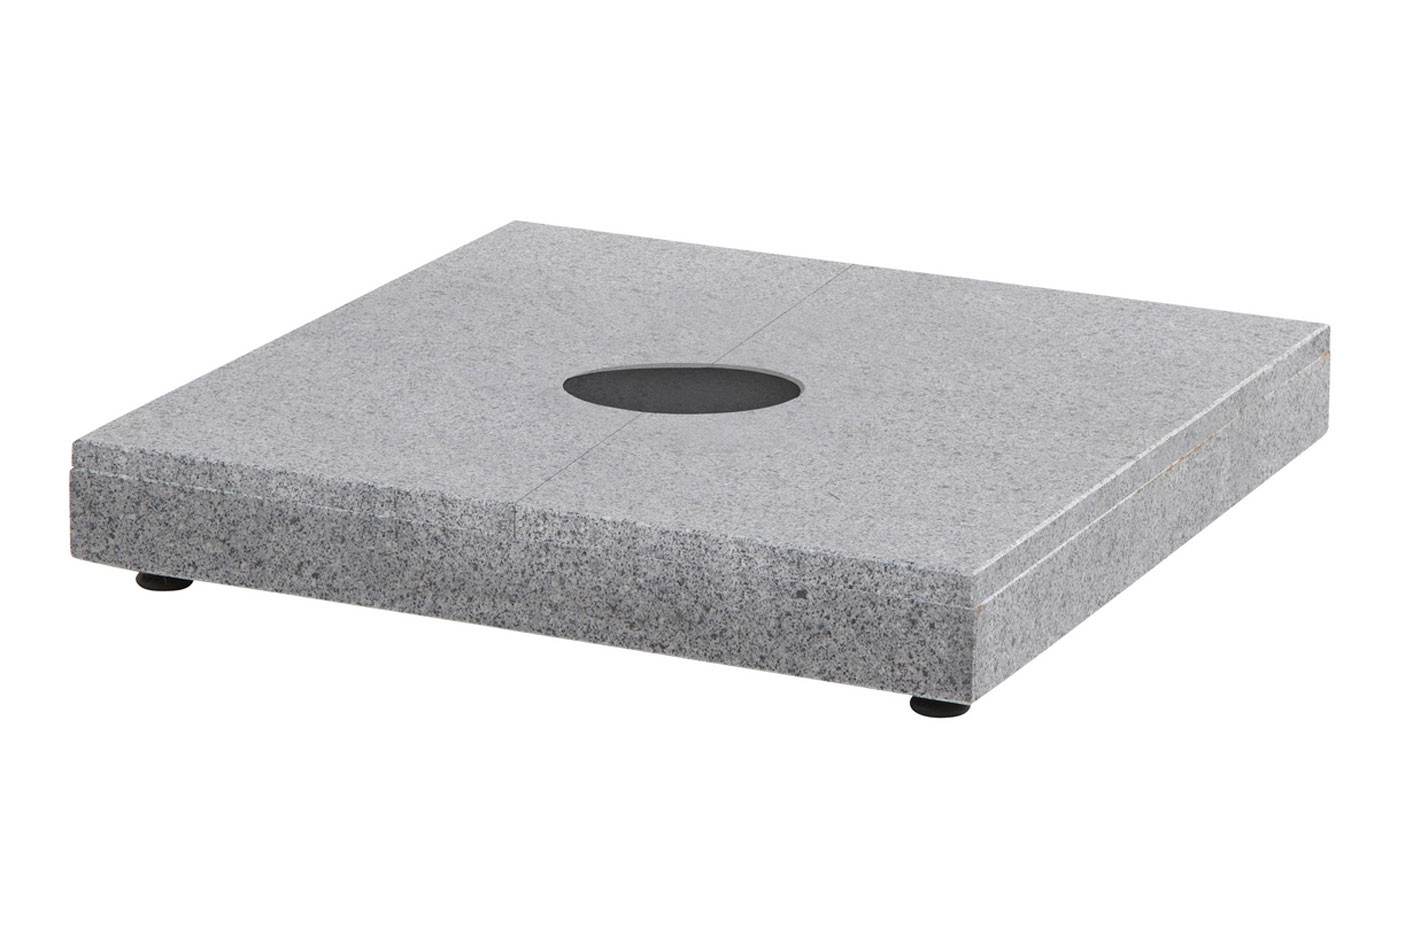 Granite base Anthracite 180 kg